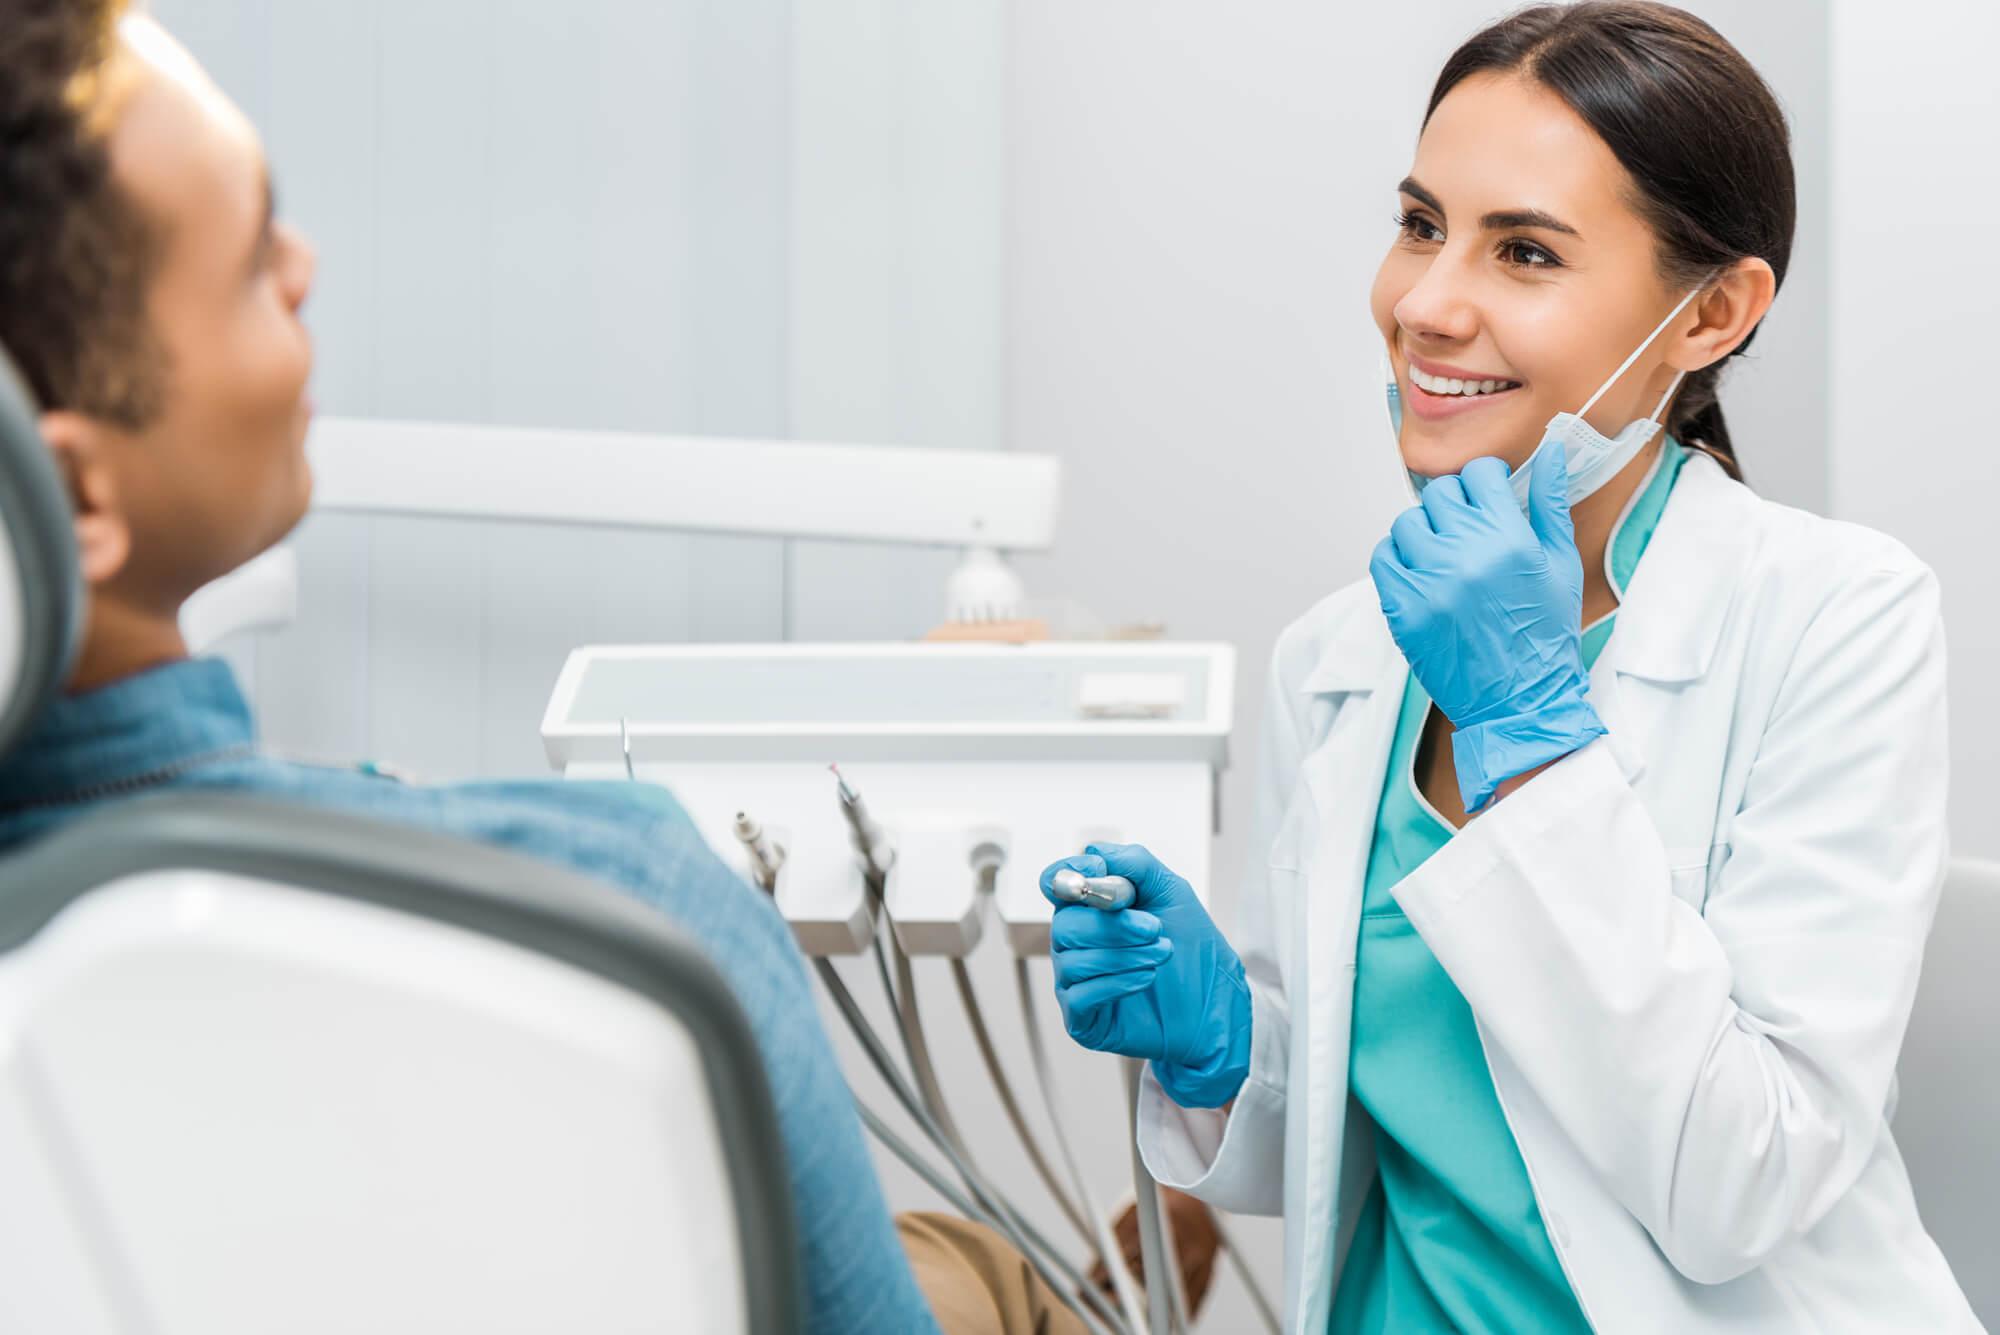 dentist Endodontic Microsurgery Midlothian